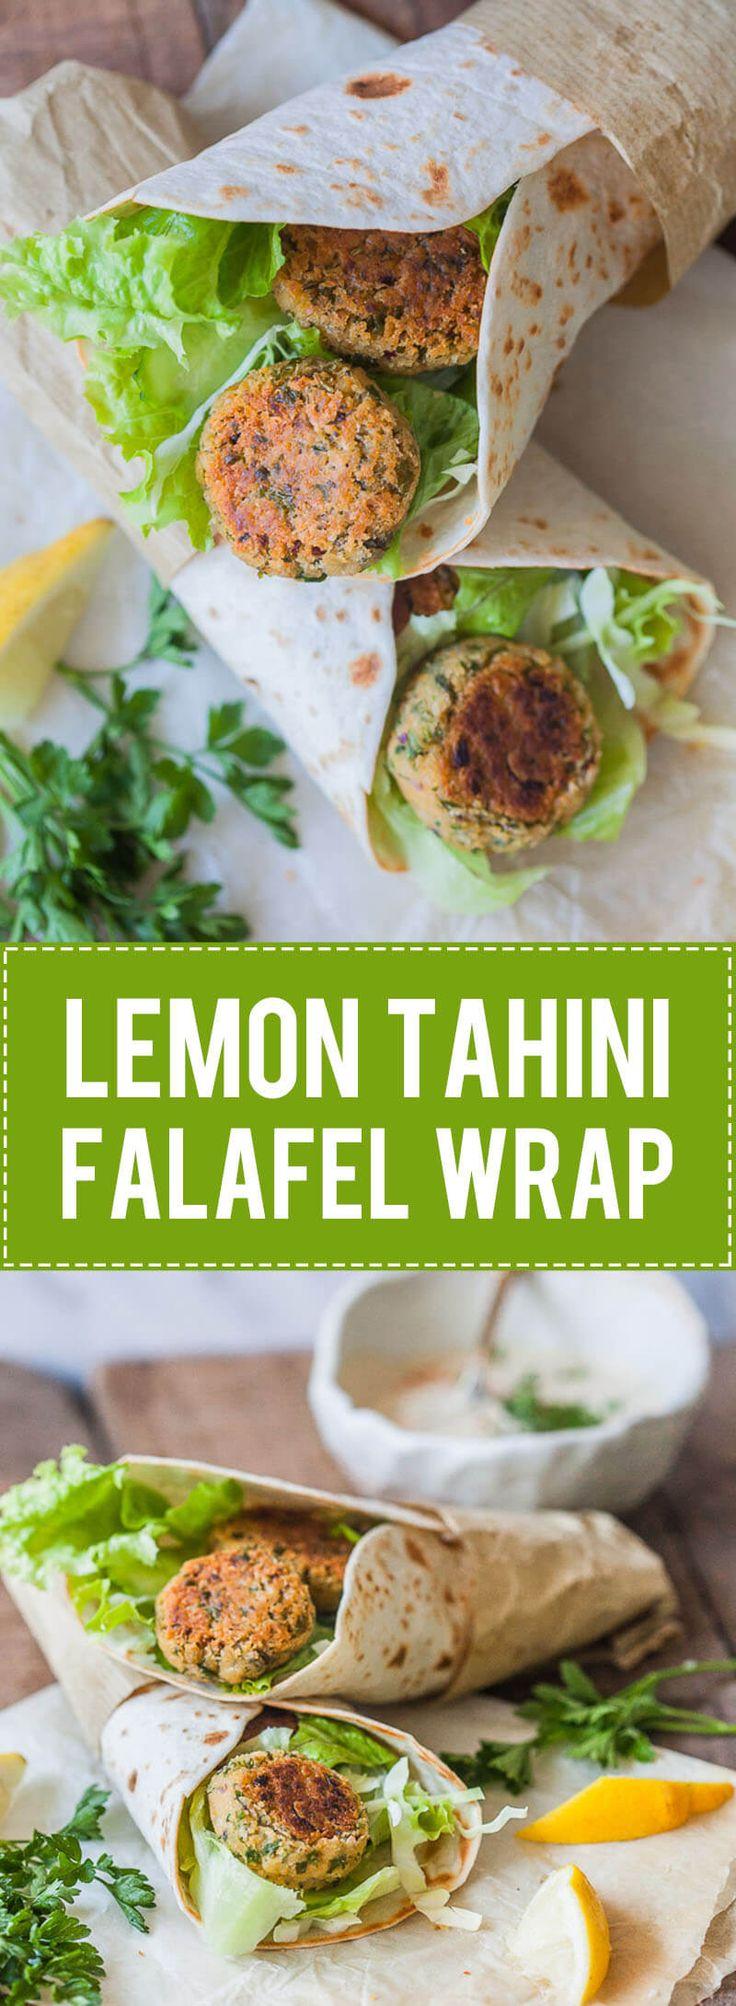 The Easiest Lemon Tahini Falafel Wrap, topped with a delicious Lemon Tahini Sauce is a quick & vegan meal. | www.vibrantplate.com